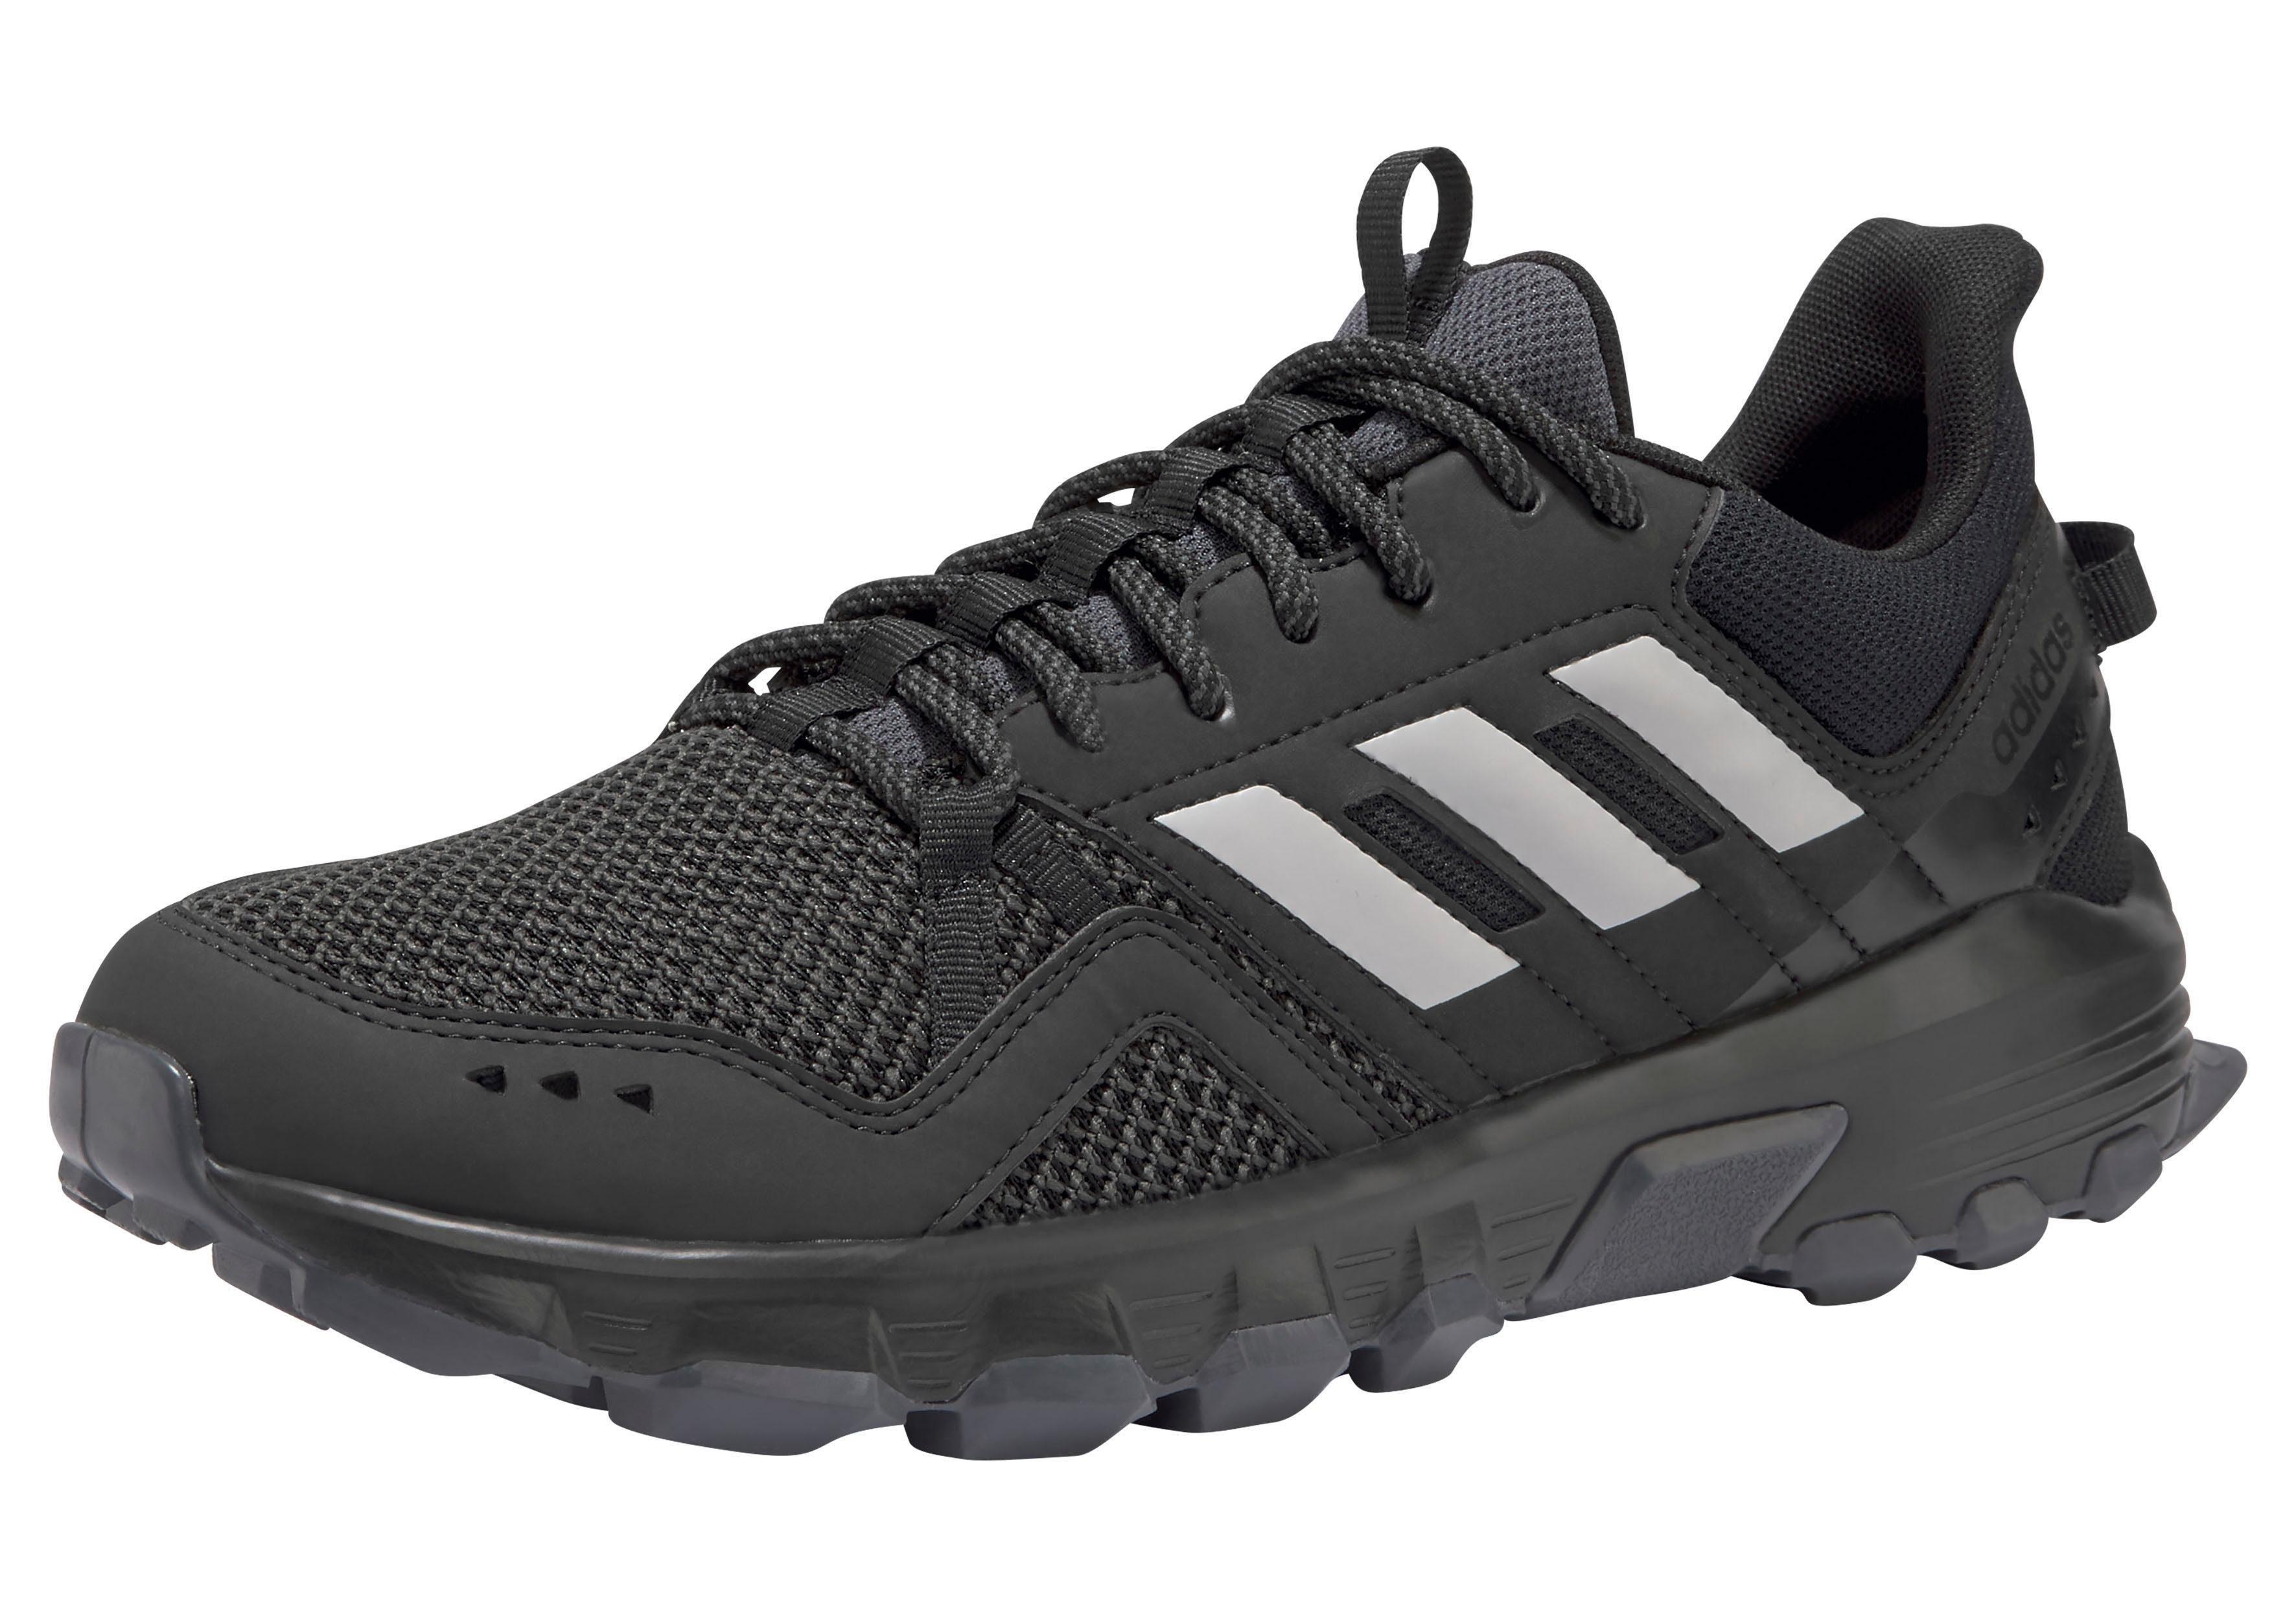 adidas Laufschuh Rockadia Trail M schwarz weiß Textil